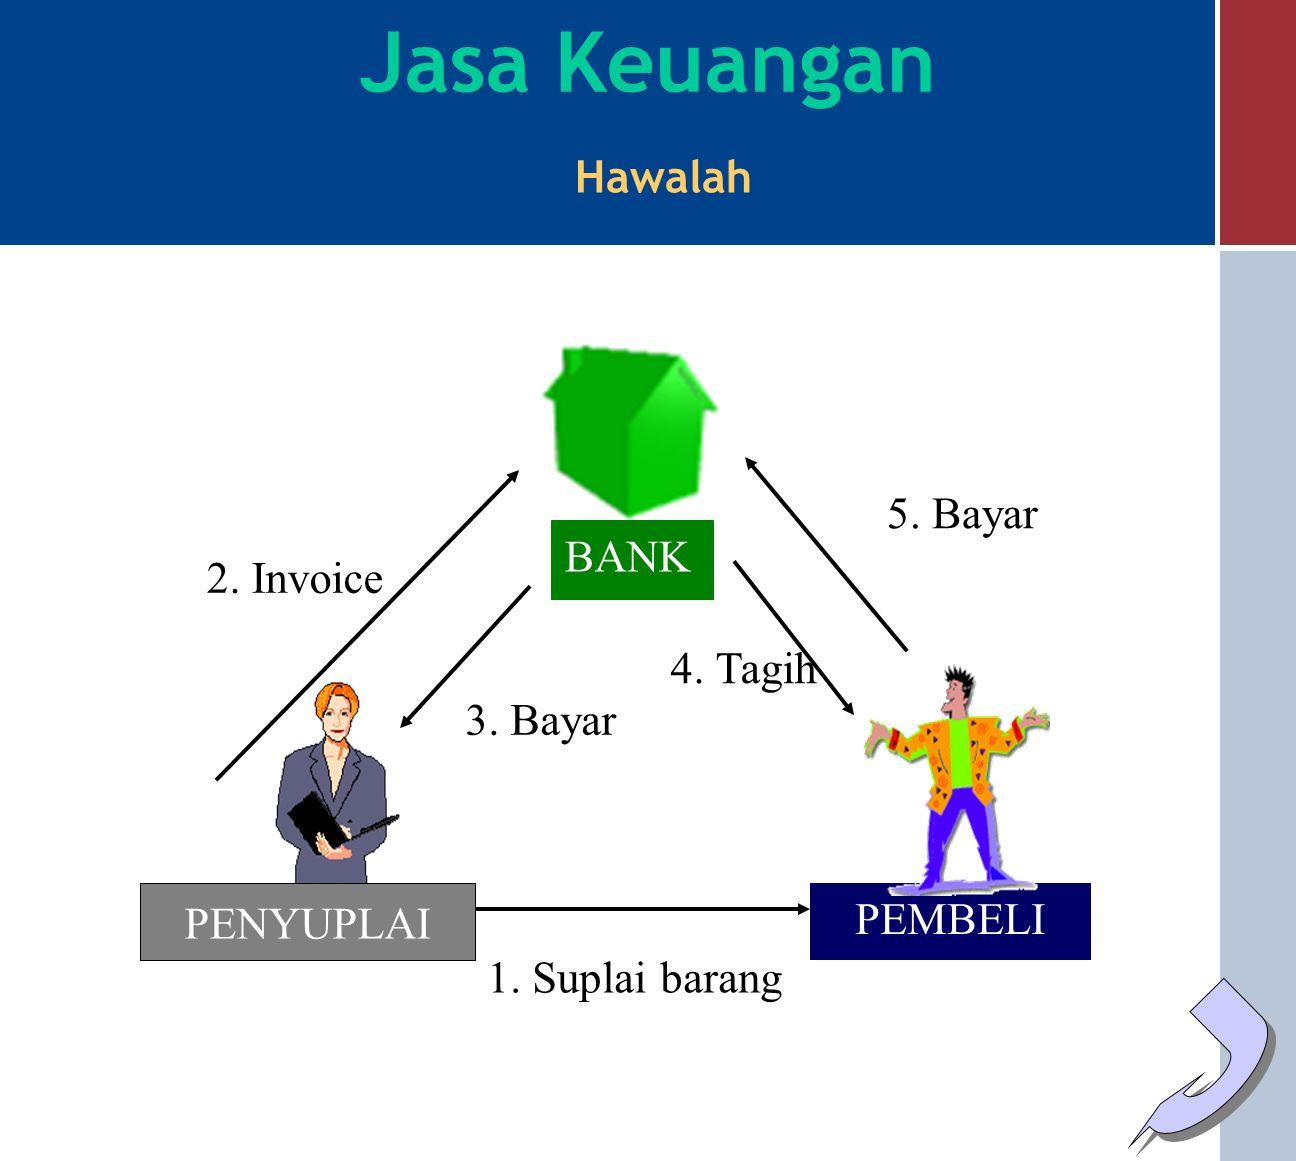 Jasa Keuangan Hawalah 5. Bayar BANK 2. Invoice 4. Tagih 3. Bayar